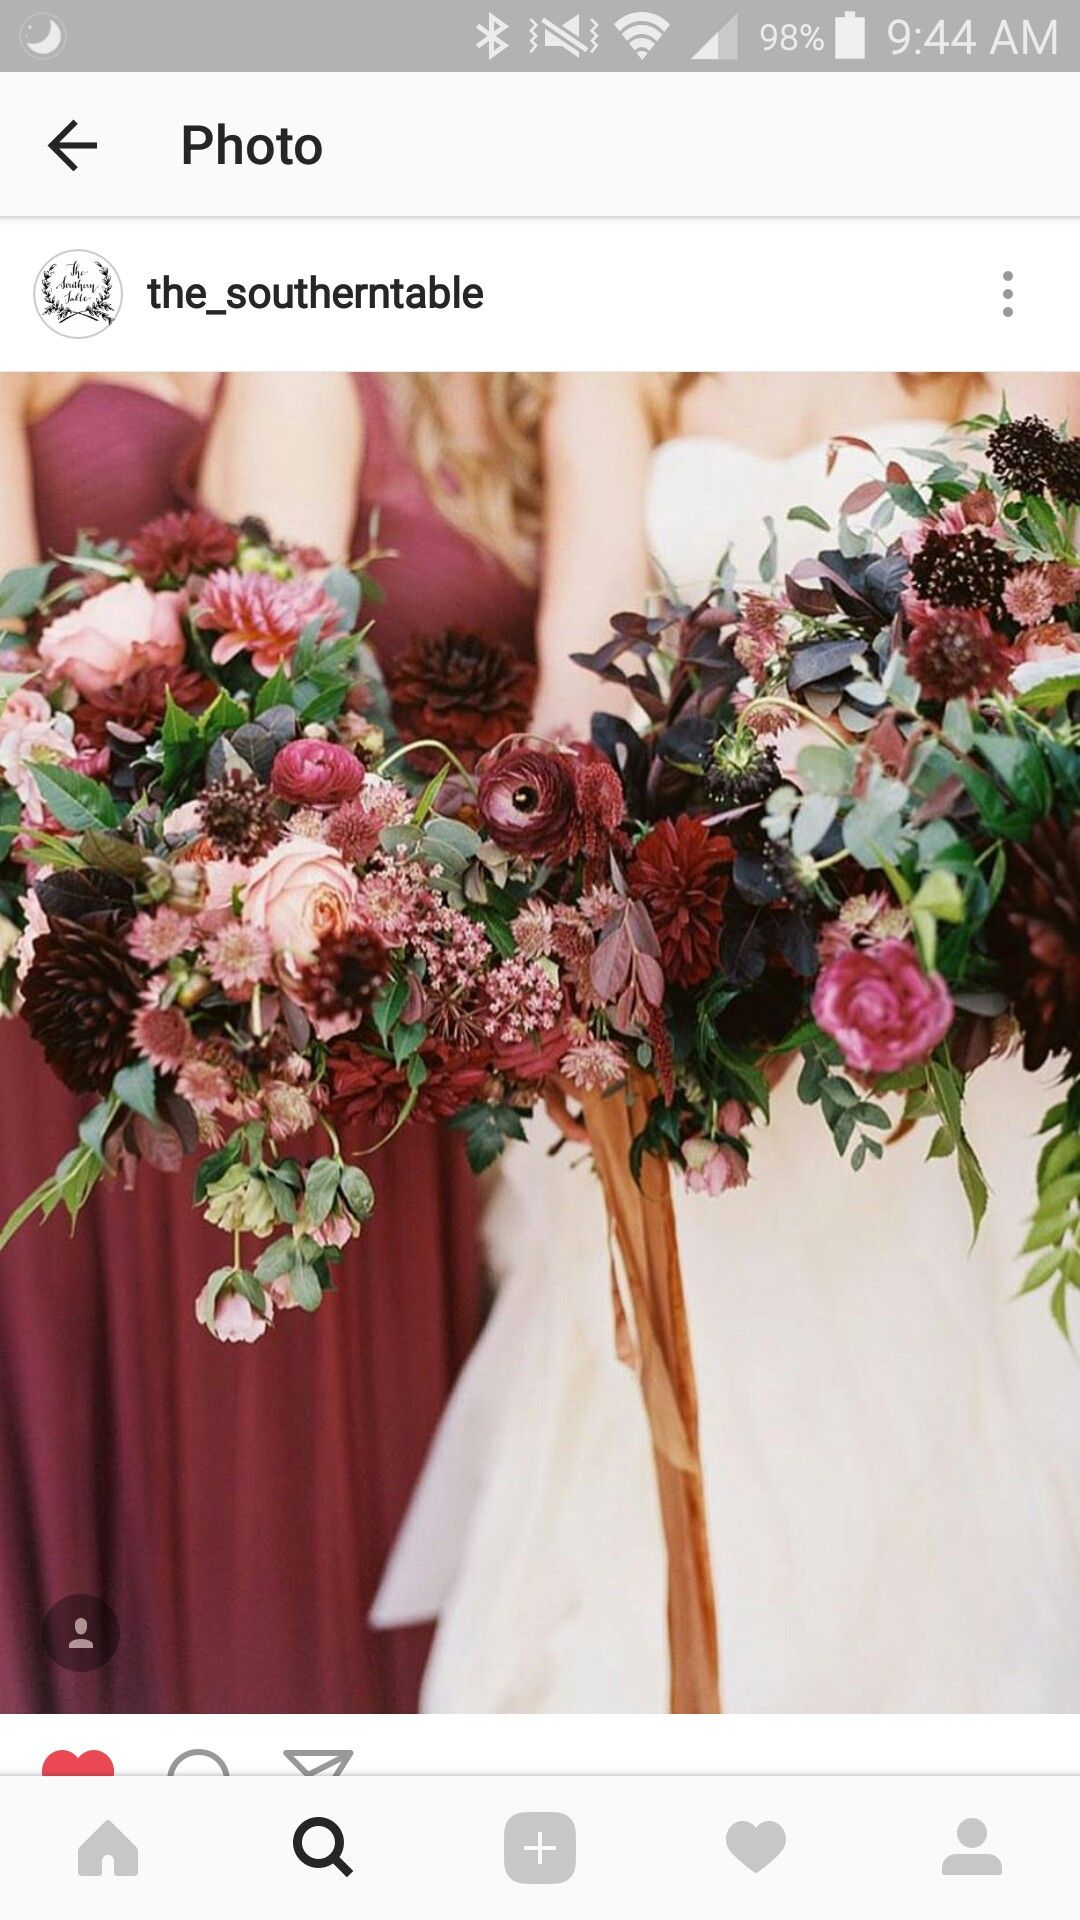 Pin by Kaley Wenda on Flowers | Pinterest | Flowers